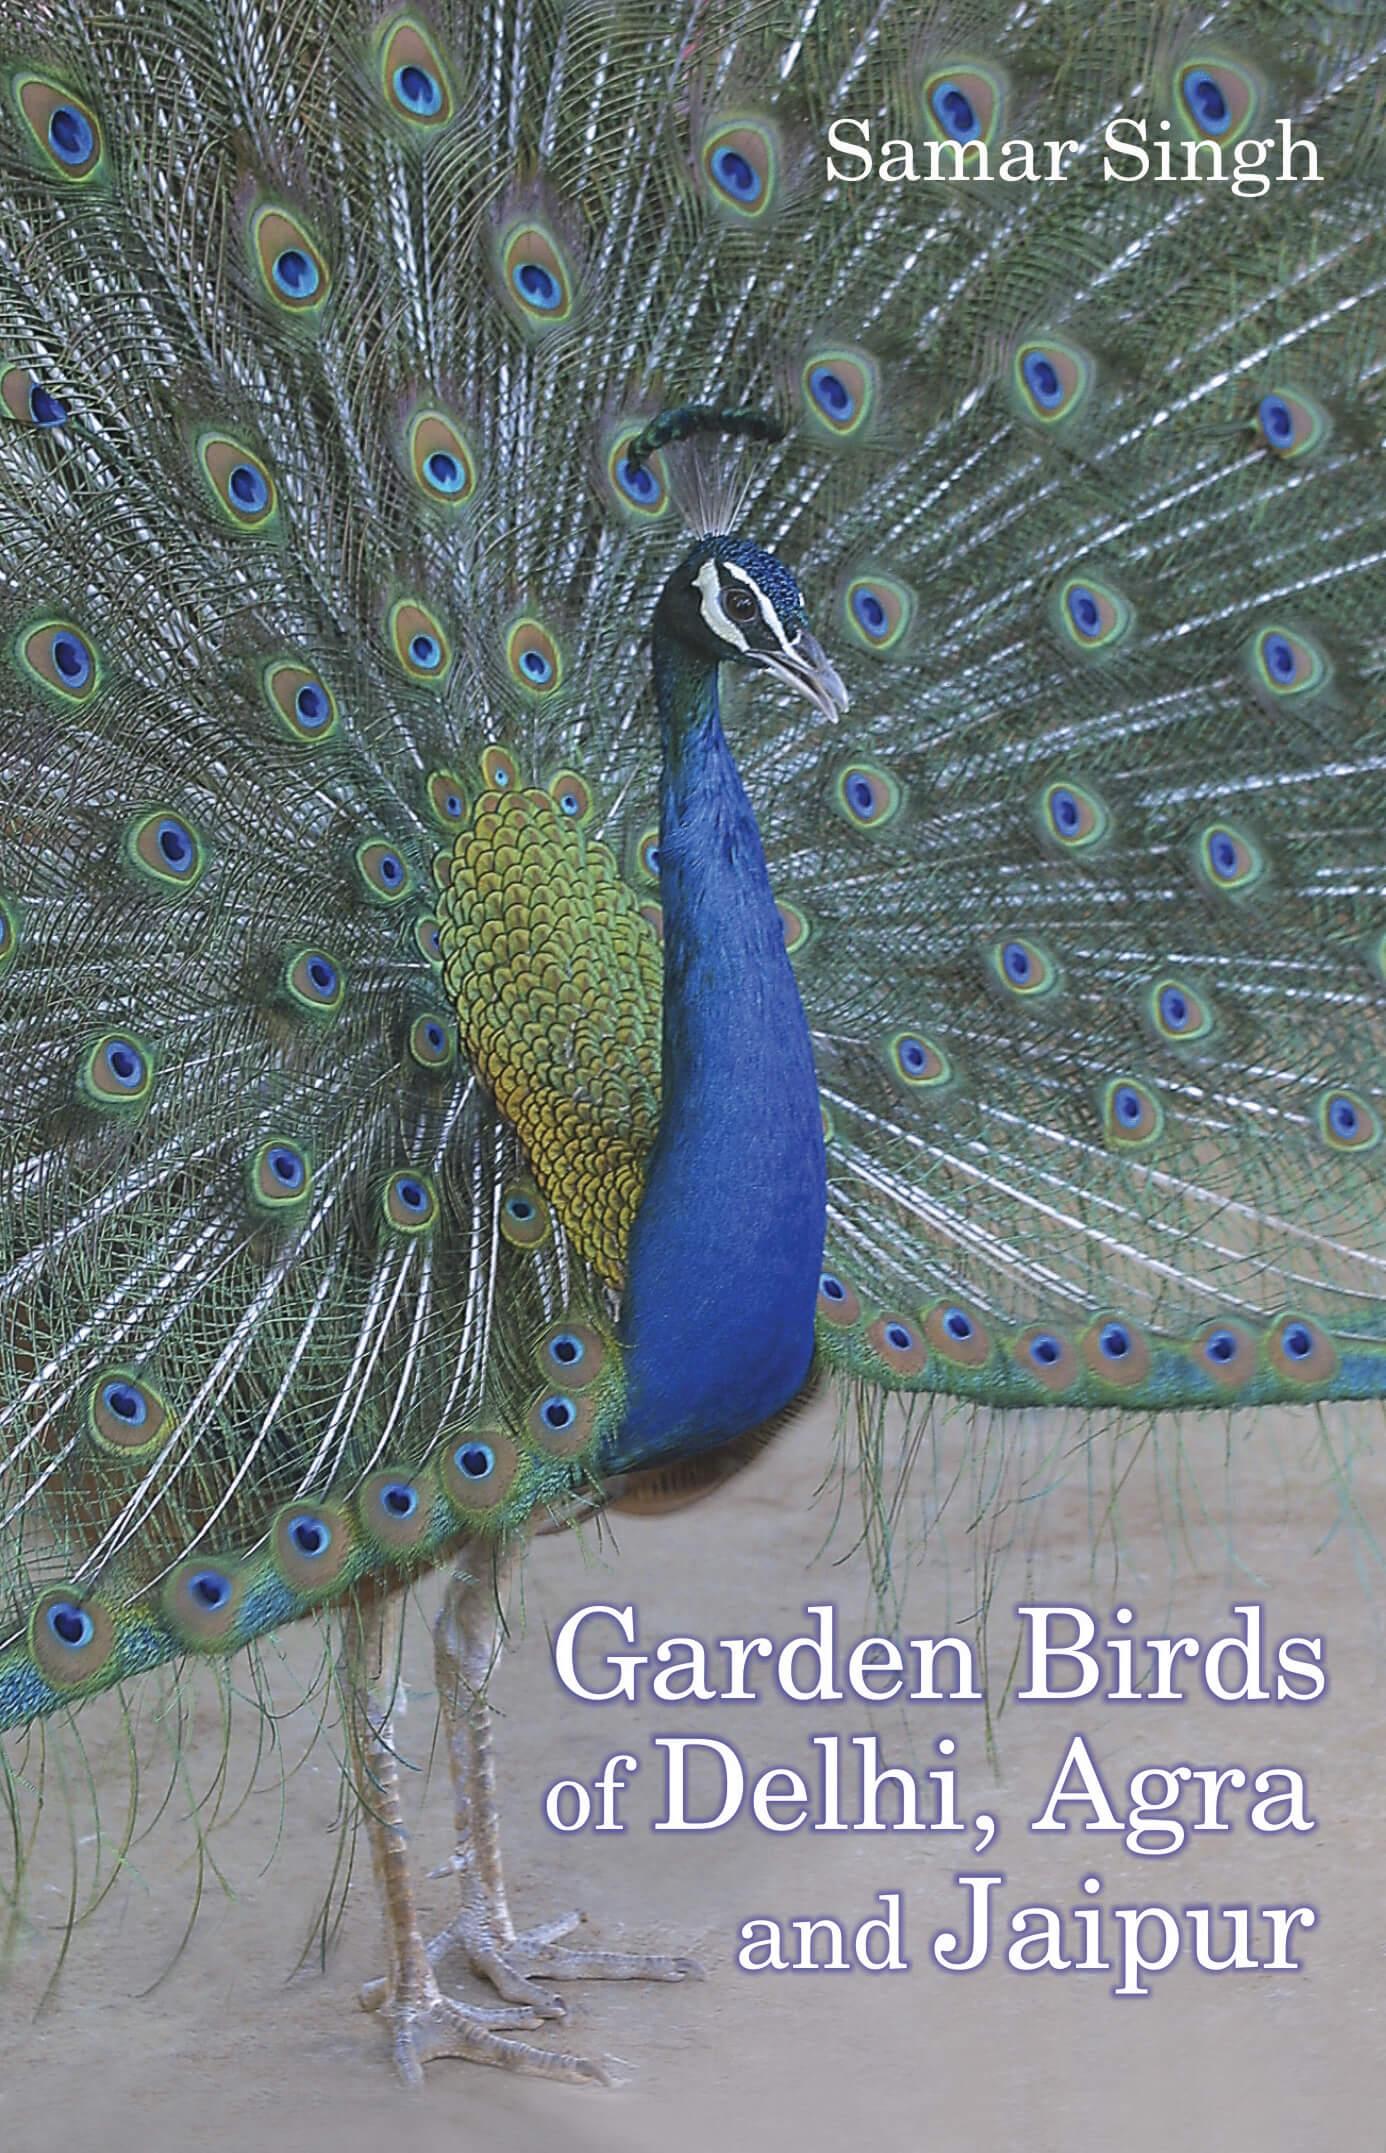 Garden Birds Of Delhi, Agra & Jaipur